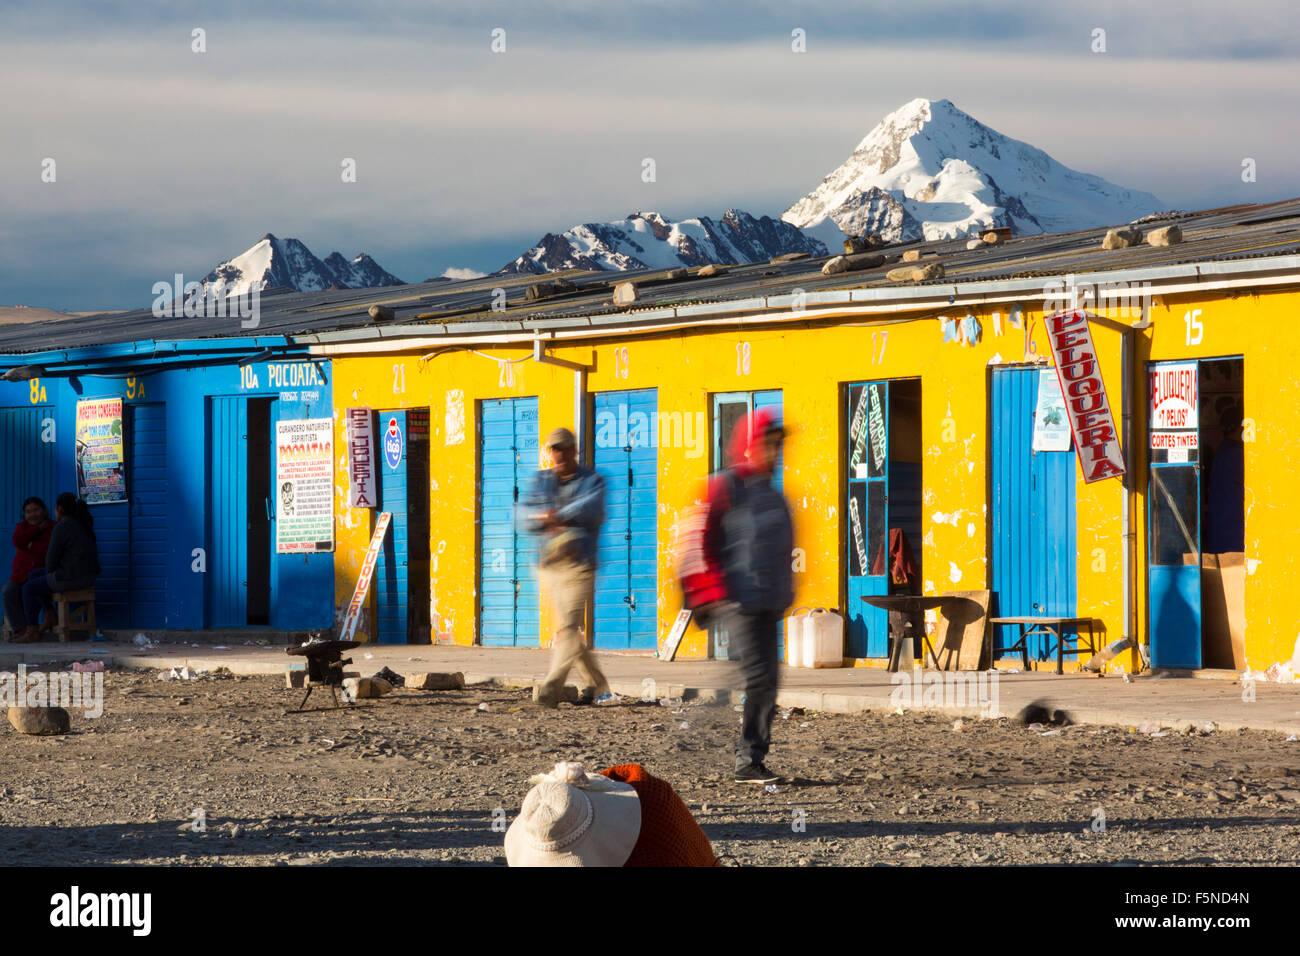 The peak of Huayna Potosi from El Alto above, La Paz, Bolivia. La Paz and El Alto are critically short of water - Stock Image